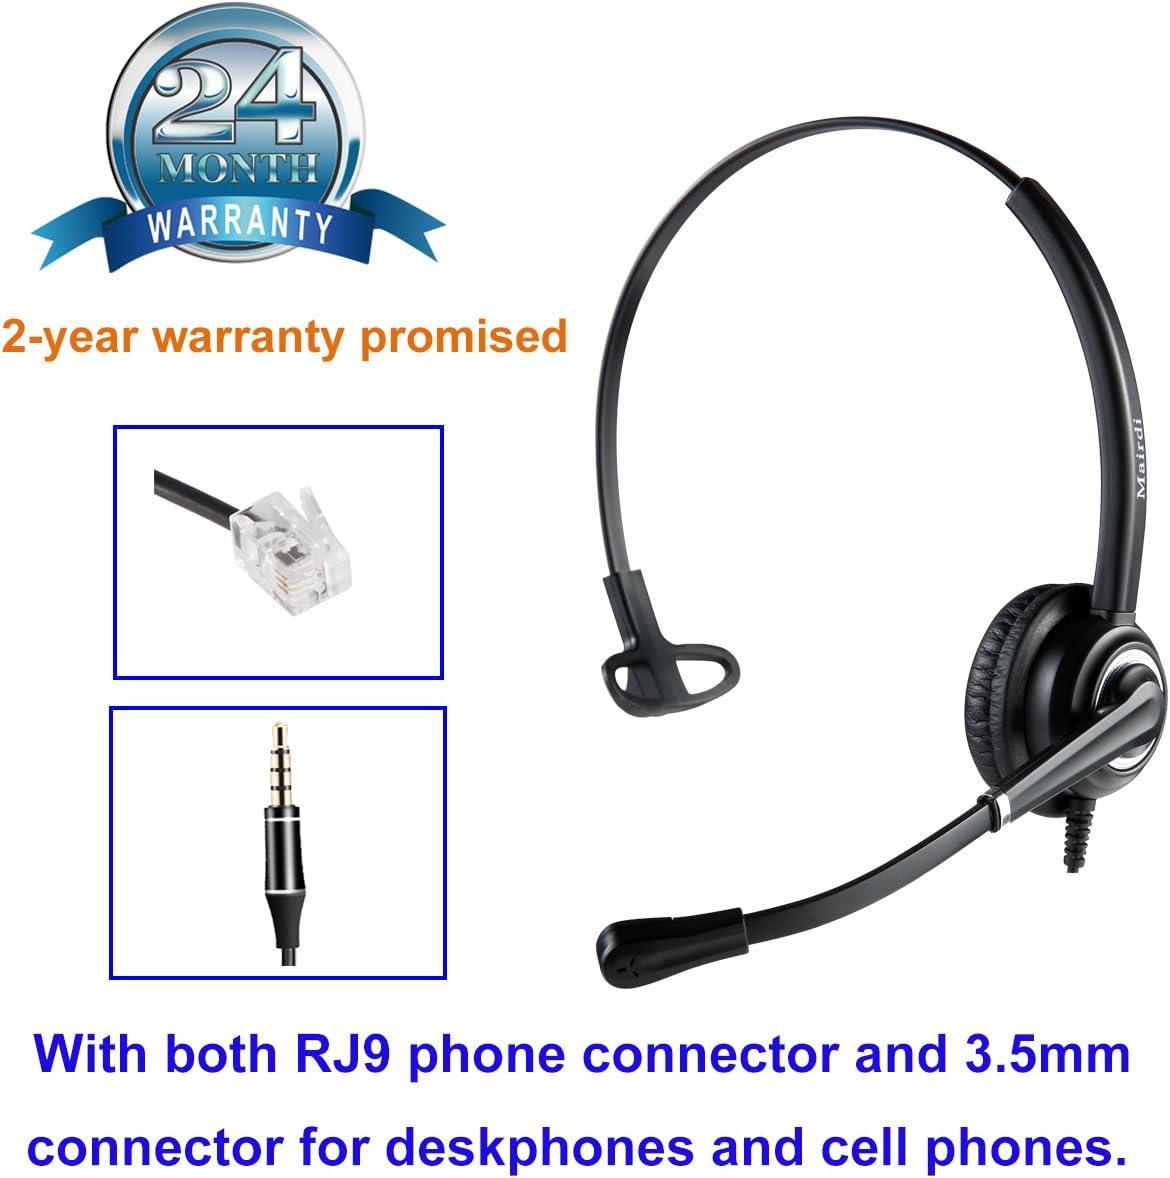 e-Learning und Musik Telefon Headset f/ür Business Skype Soft Phone Call Center B/üro Headset Handy mit Noise-Cancelling-Mikrofon VoicePro 20 Stereo USB Headset f/ür entspanntes Gaming